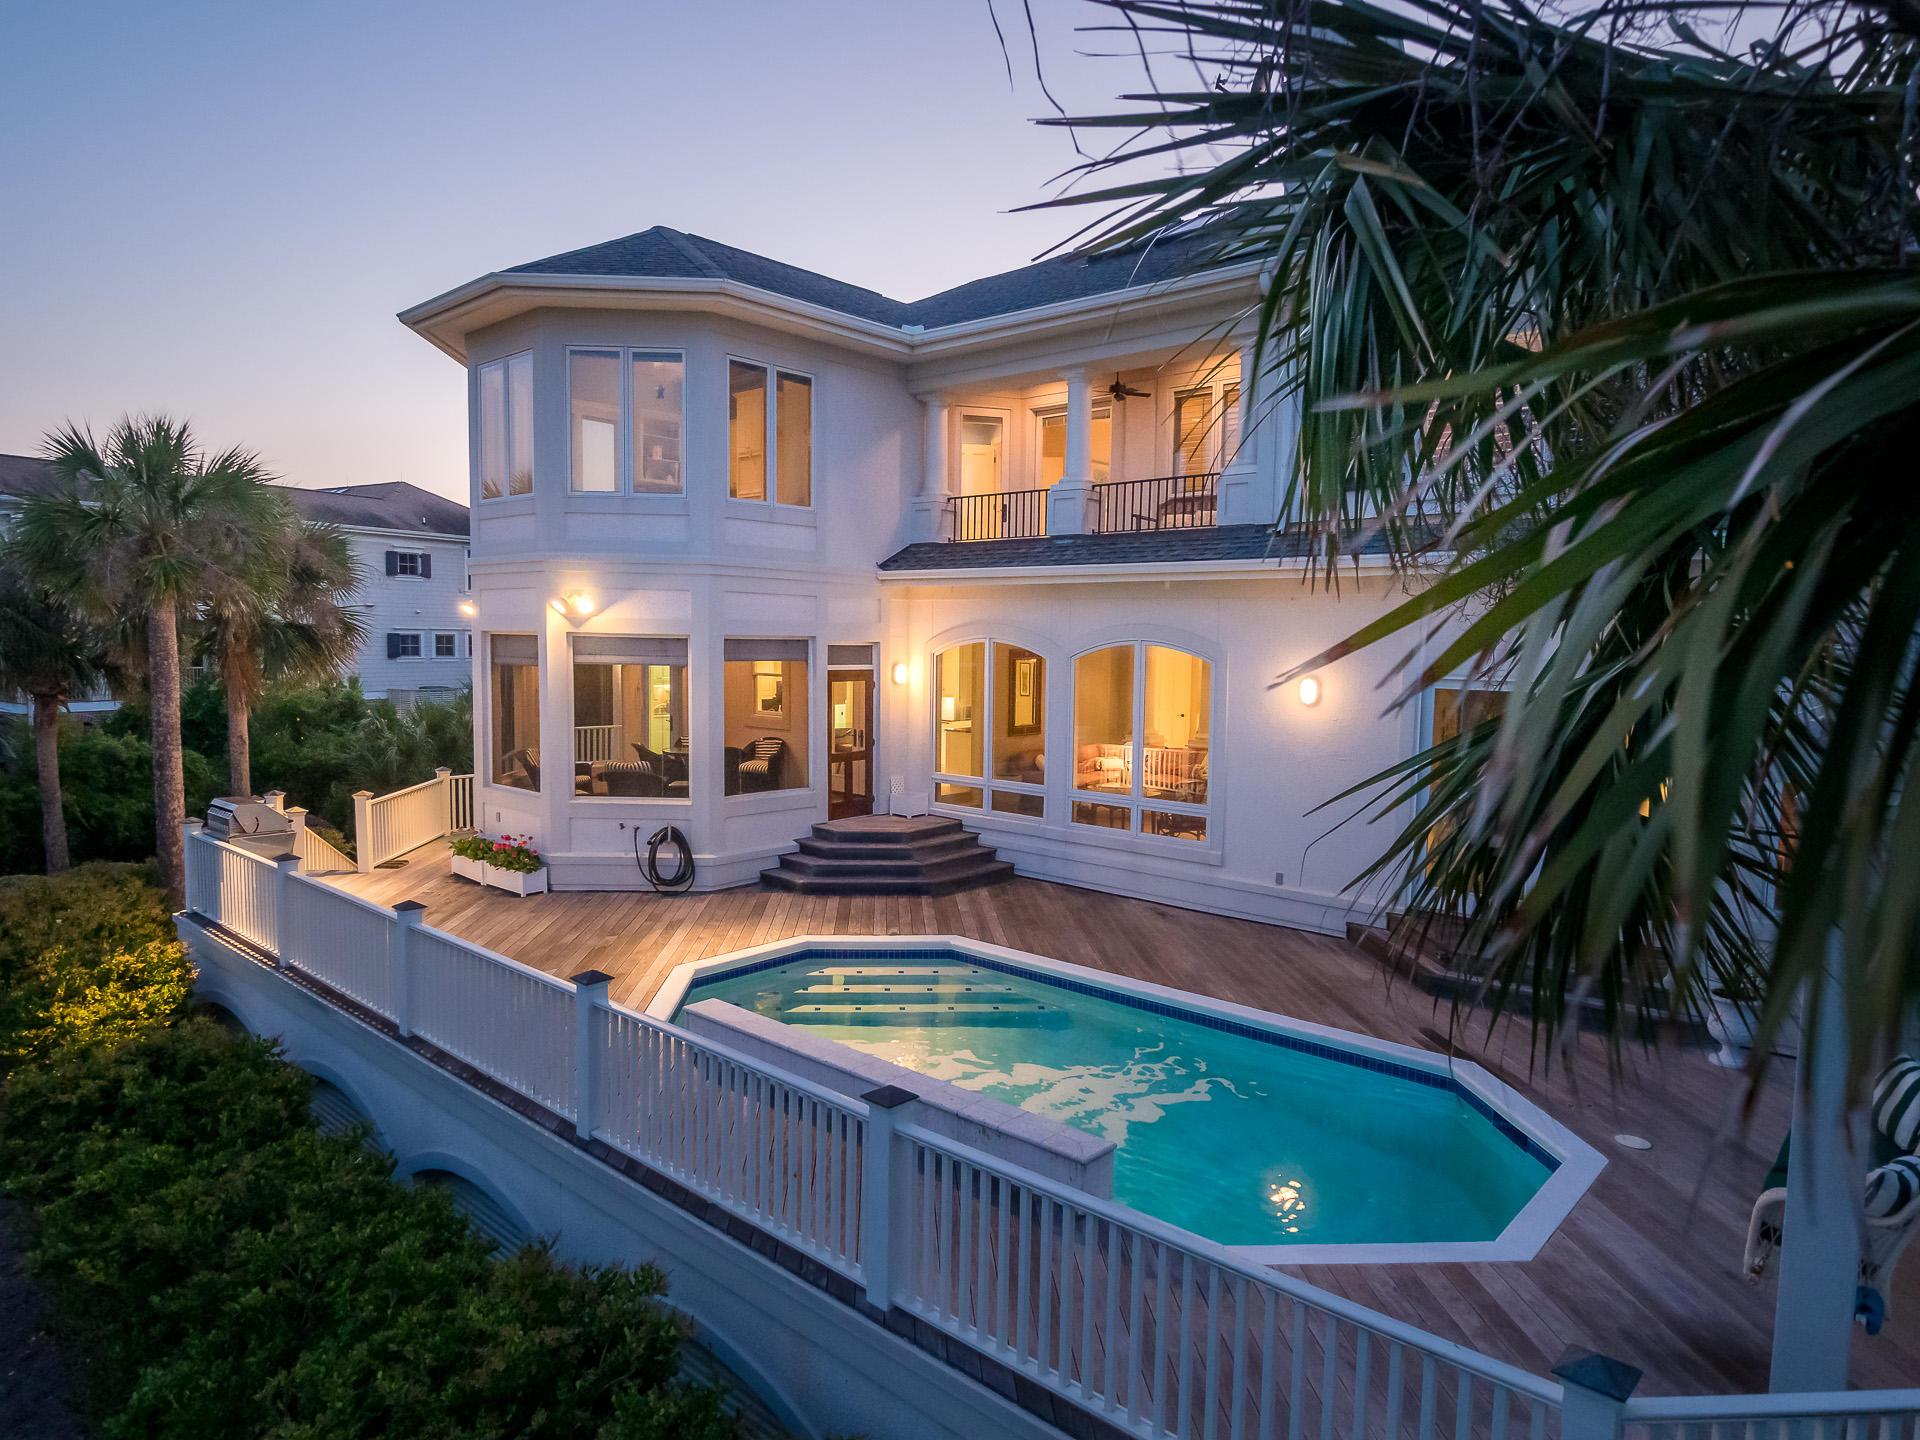 Seabrook Island Homes For Sale - 2216 Rolling Dune, Seabrook Island, SC - 9